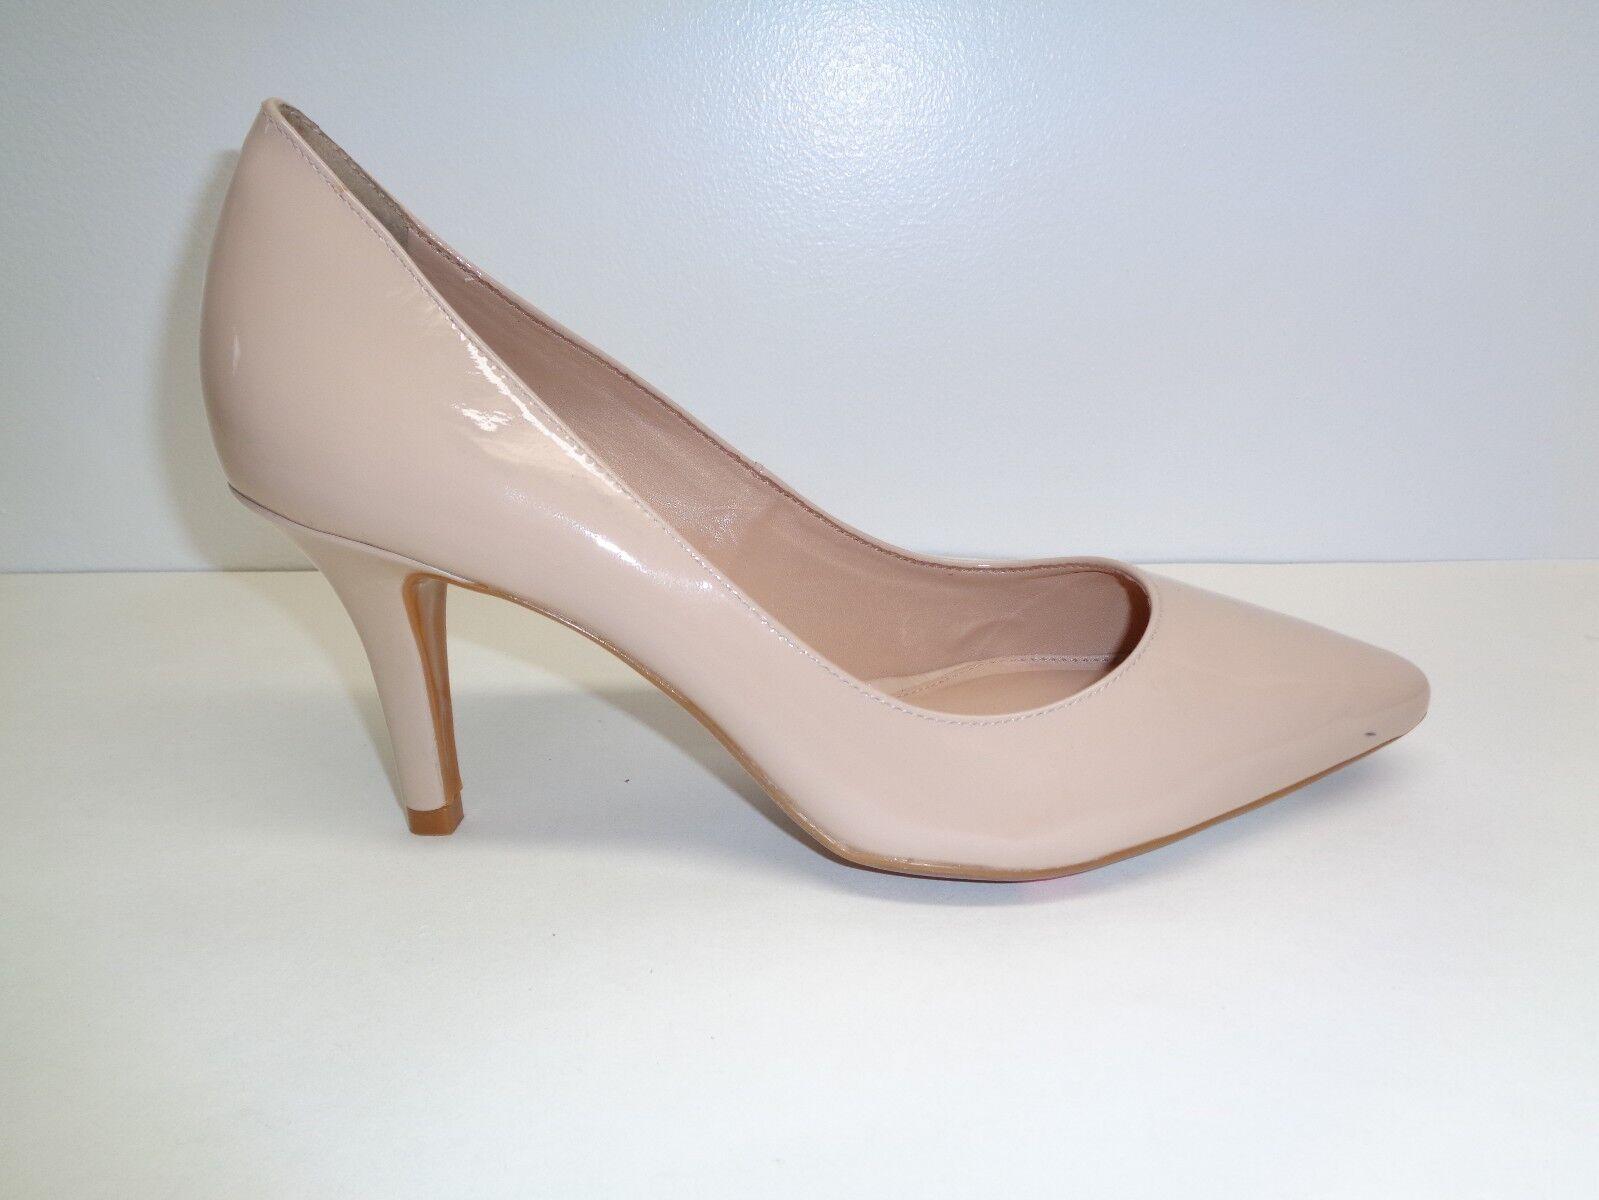 Antonio Melani Size 9 M Beige ODETAH Beige M Patent Leather Heels Pumps New Womens Shoes 08a75a